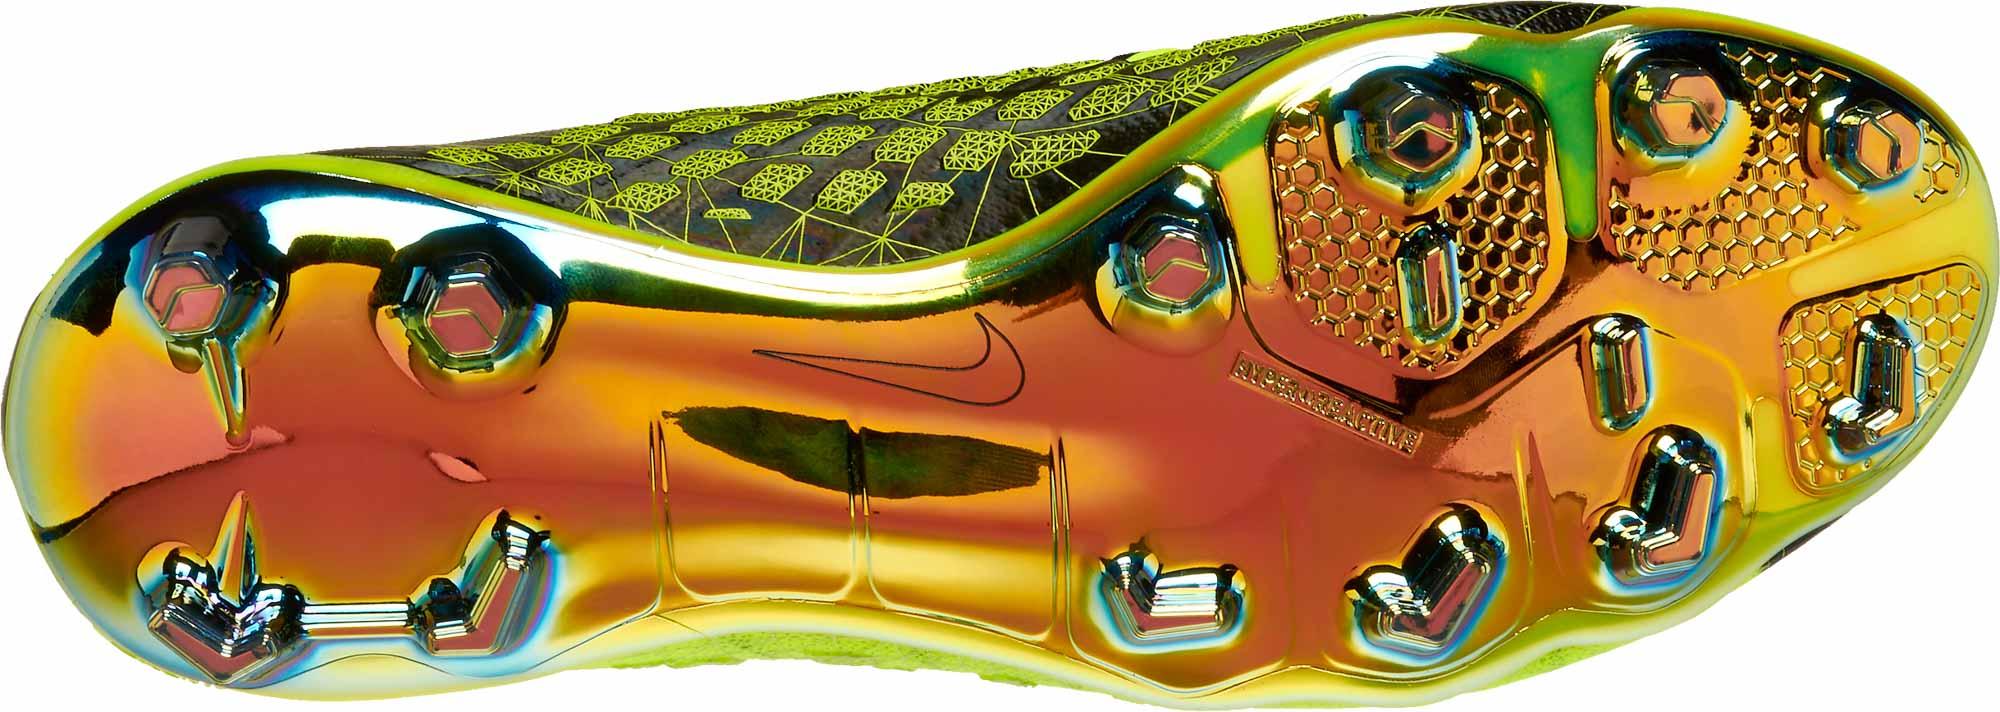 latest design sports shoes quality design Nike Kids Hypervenom Phantom III DF FG - EA Sports - Volt ...